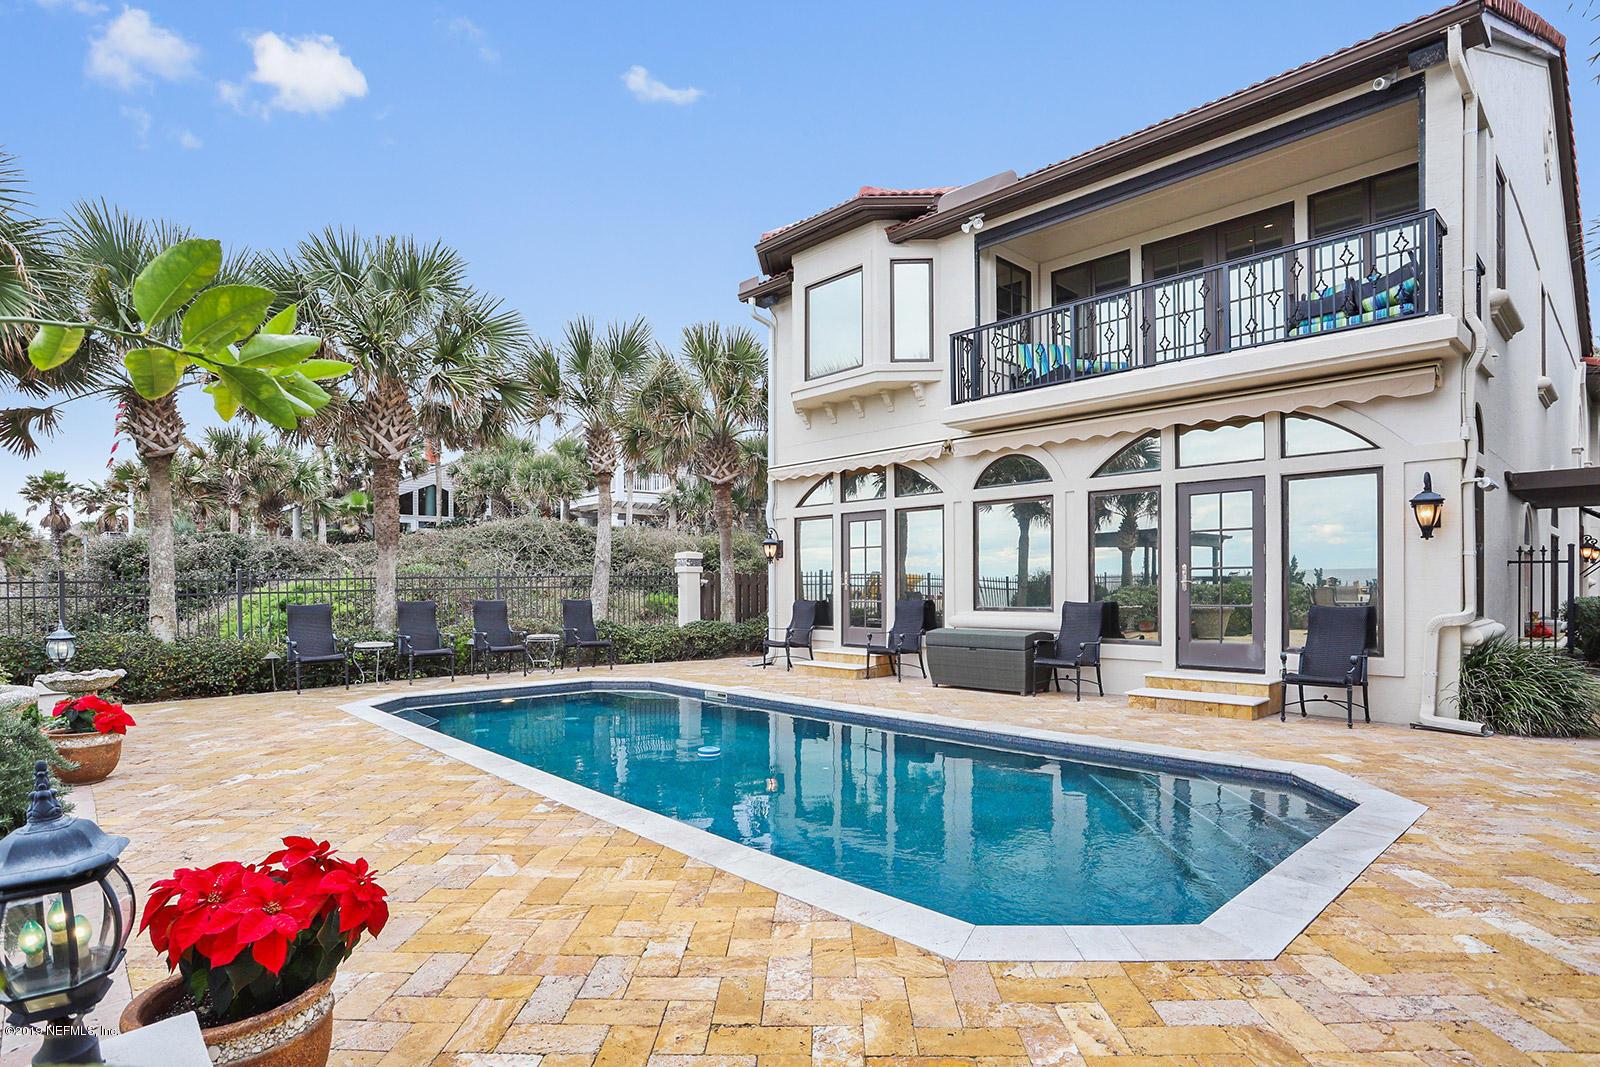 2093 BEACH, ATLANTIC BEACH, FLORIDA 32233, 4 Bedrooms Bedrooms, ,3 BathroomsBathrooms,Residential,For sale,BEACH,1072859